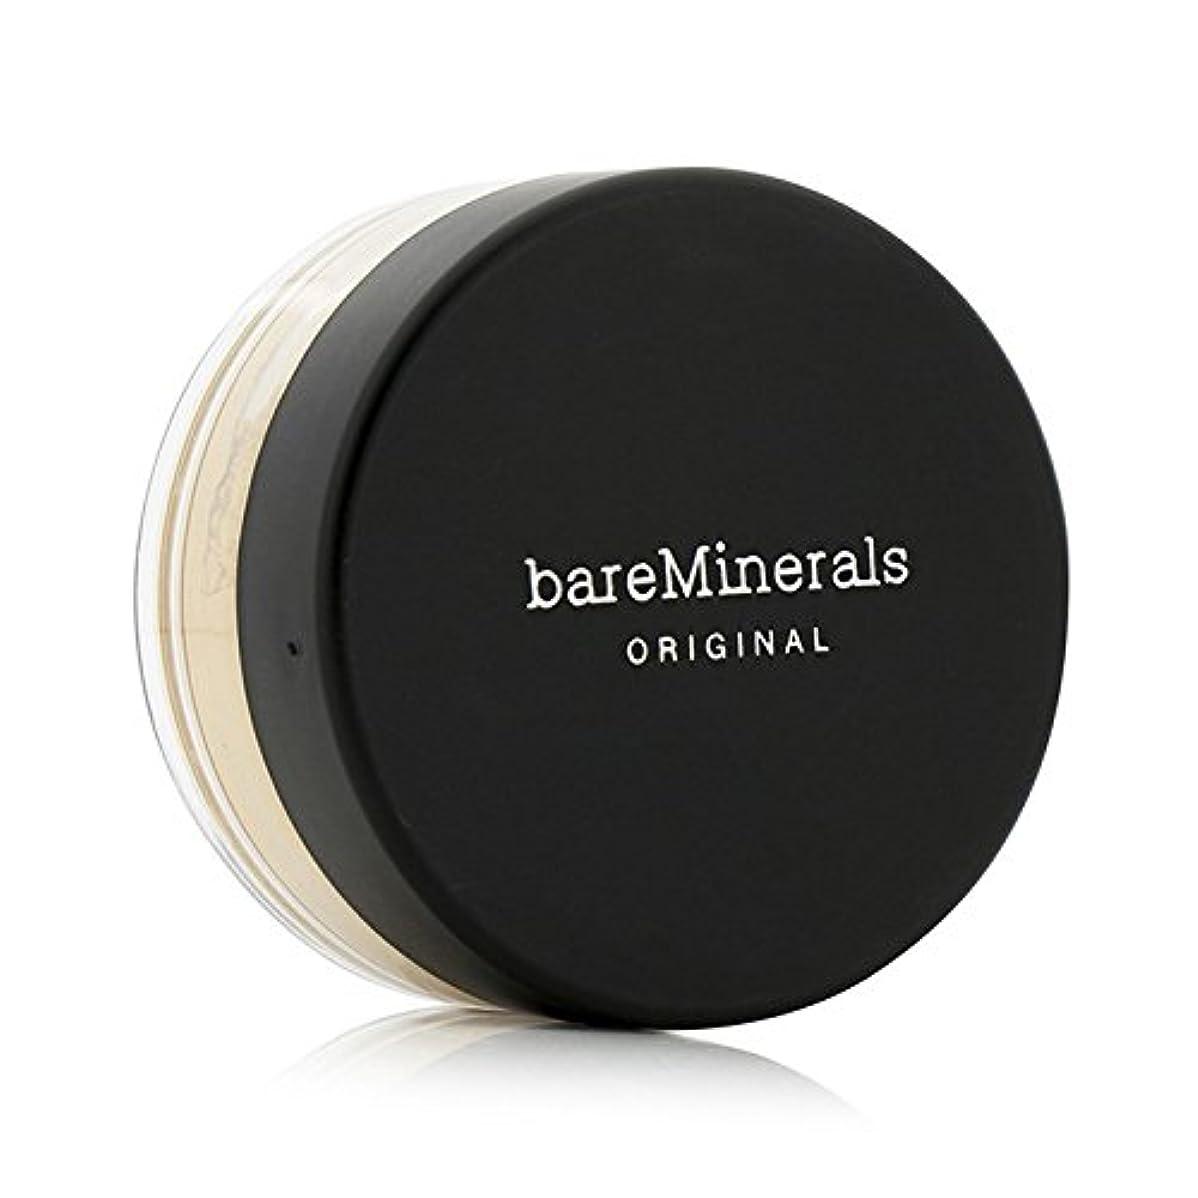 BareMinerals ベアミネラルオリジナル SPF 15 ファンデーション - # Light 8g/0.28oz[並行輸入品]